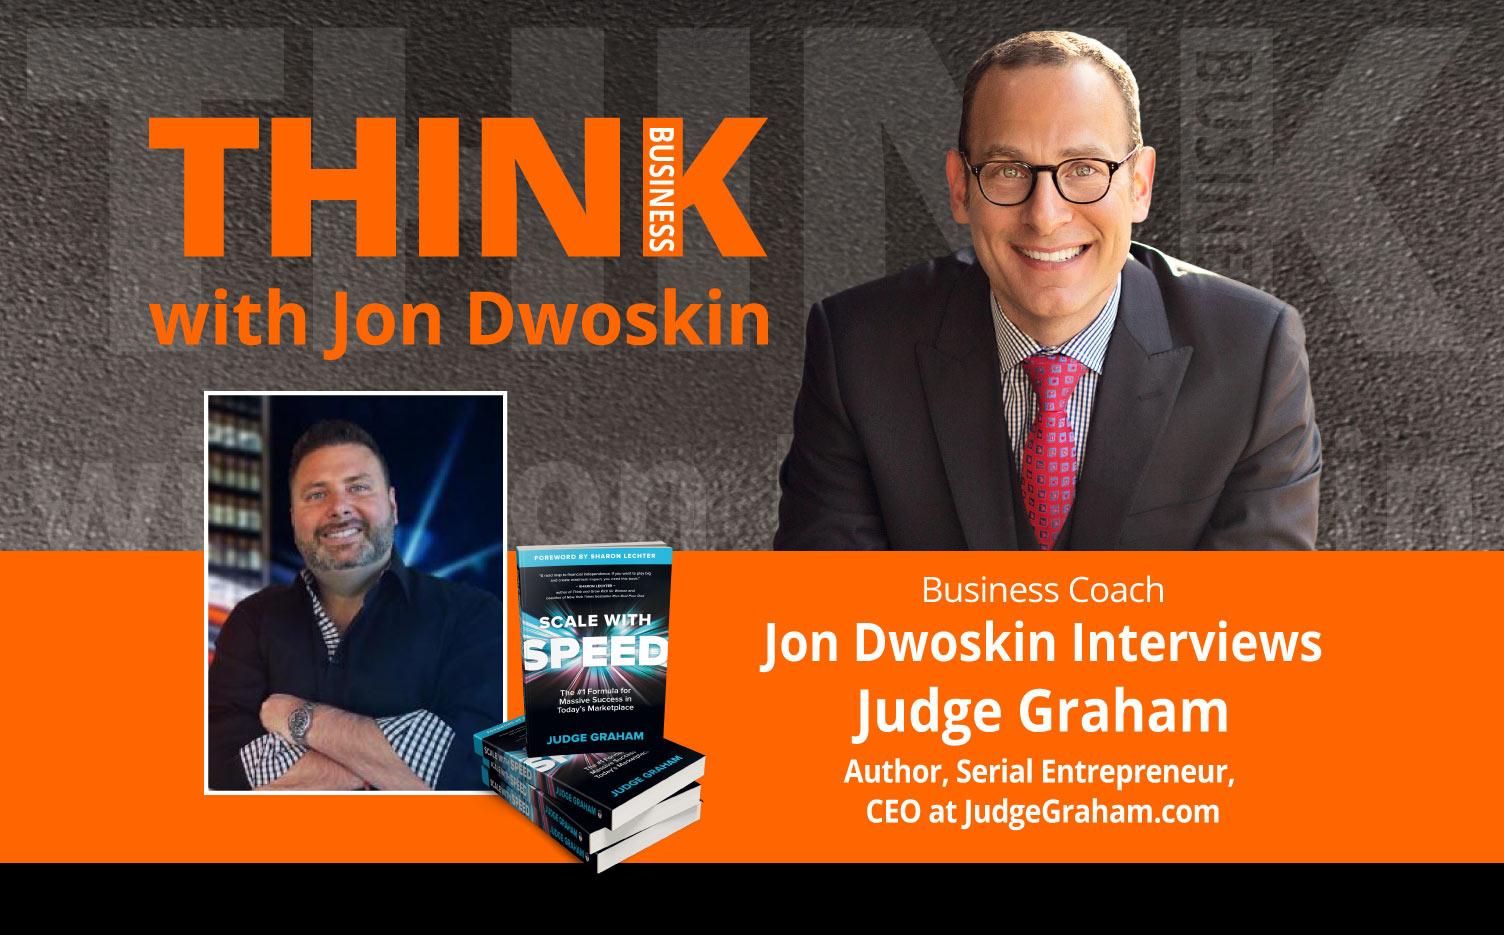 THINK Business Podcast: Jon Dwoskin Interviews Judge Graham, Author, Serial Entrepreneur, CEO at JudgeGraham.com